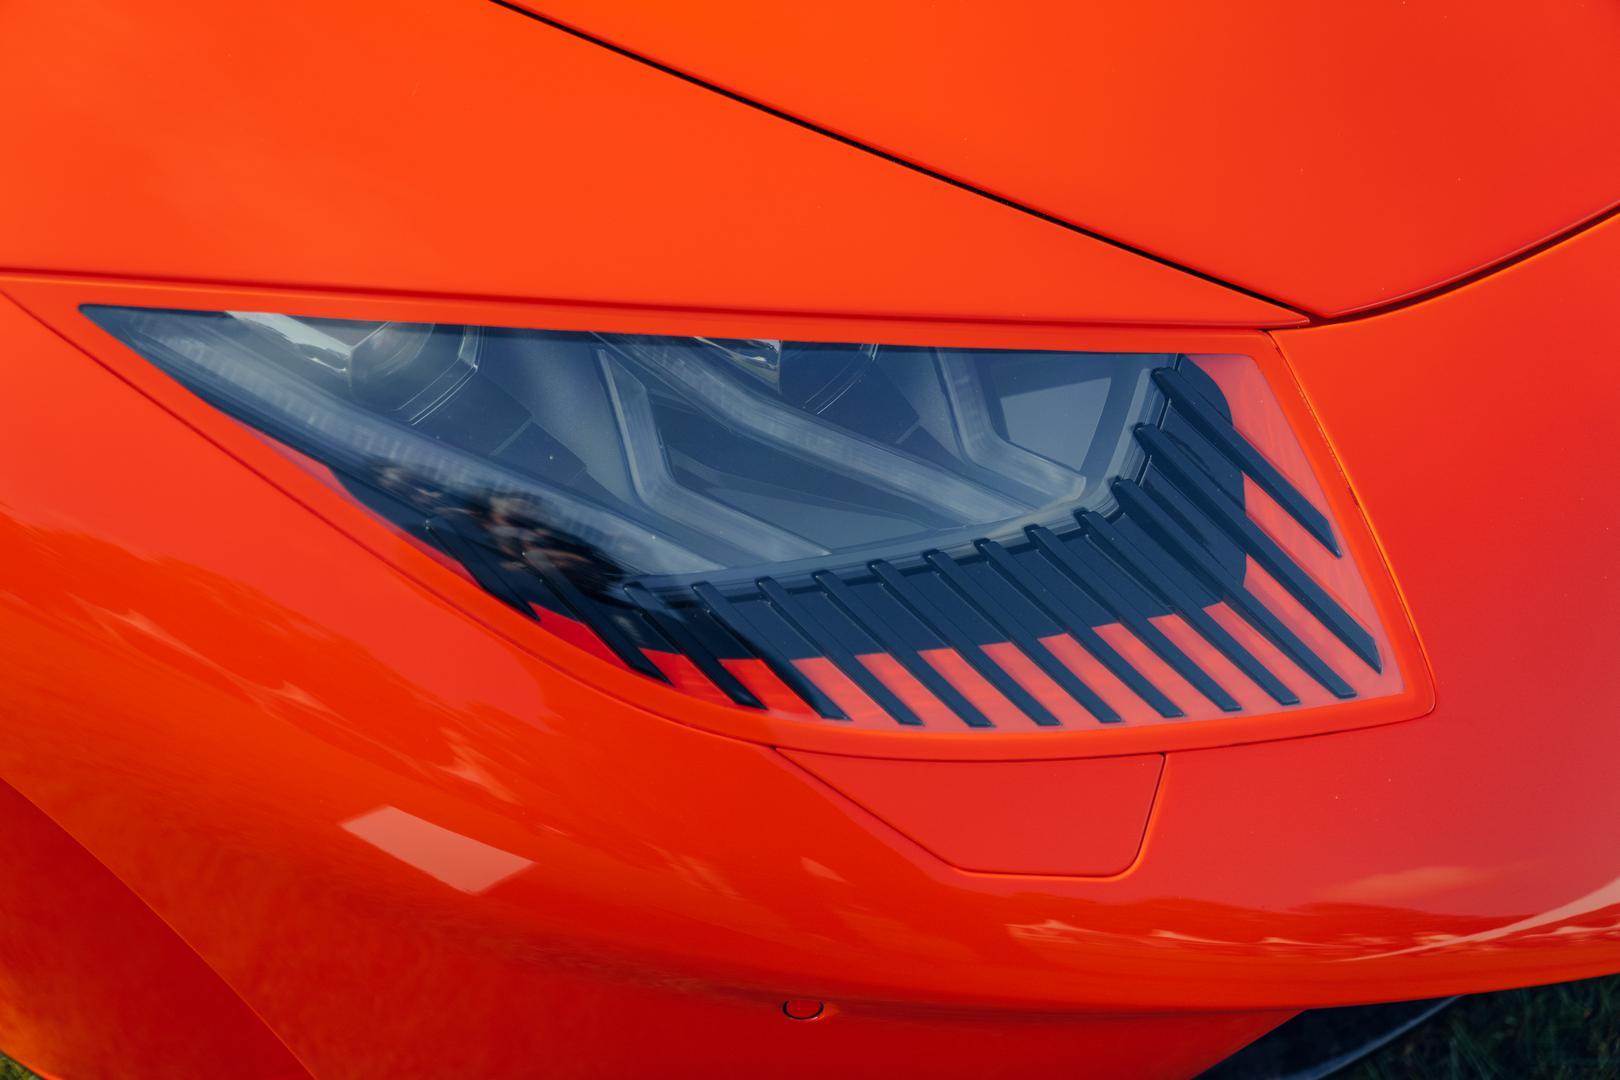 Rayo Huracan Twin-Turbo headlights